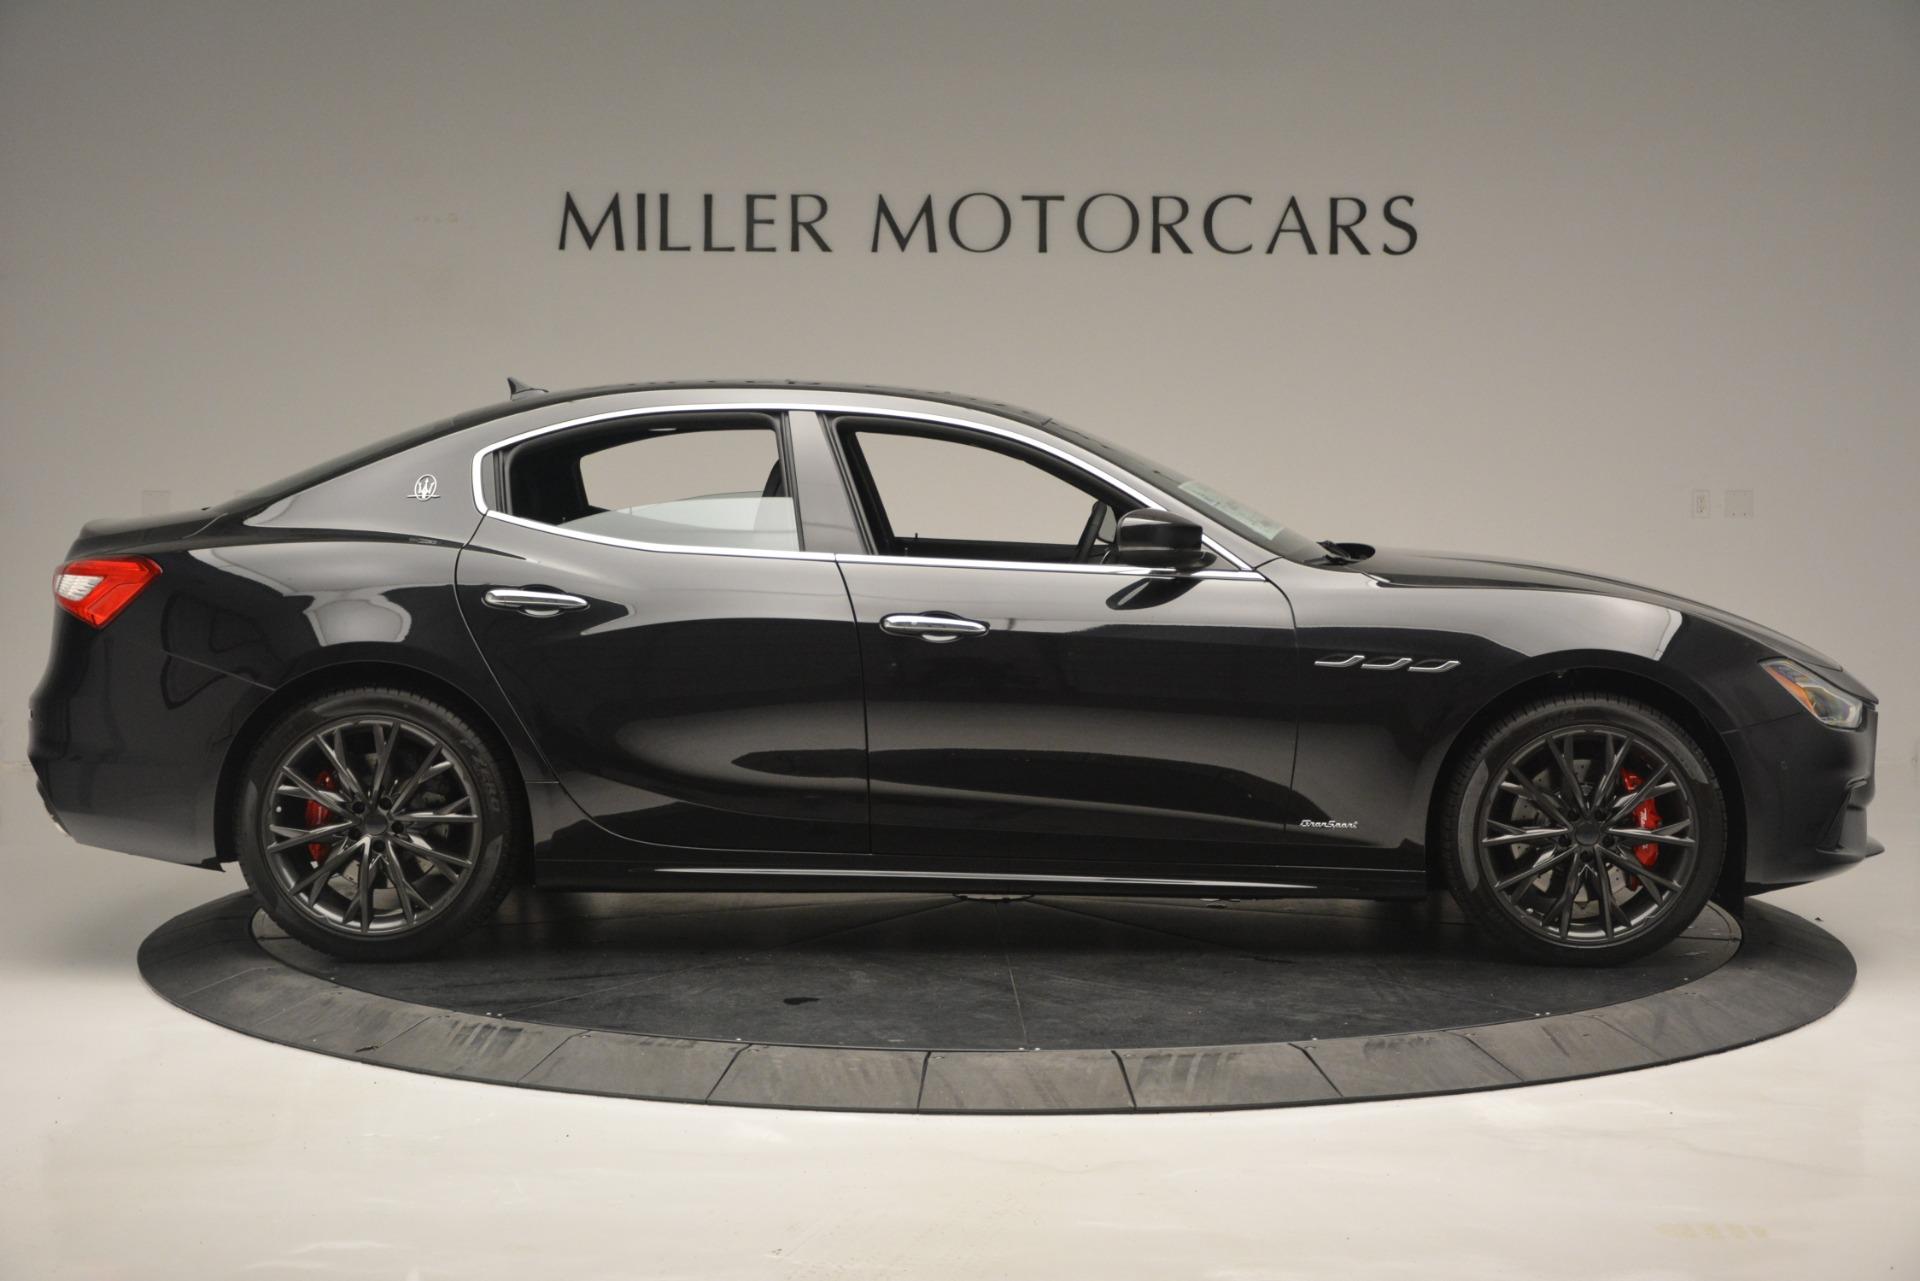 New 2019 Maserati Ghibli S Q4 GranSport For Sale In Greenwich, CT 2765_p9